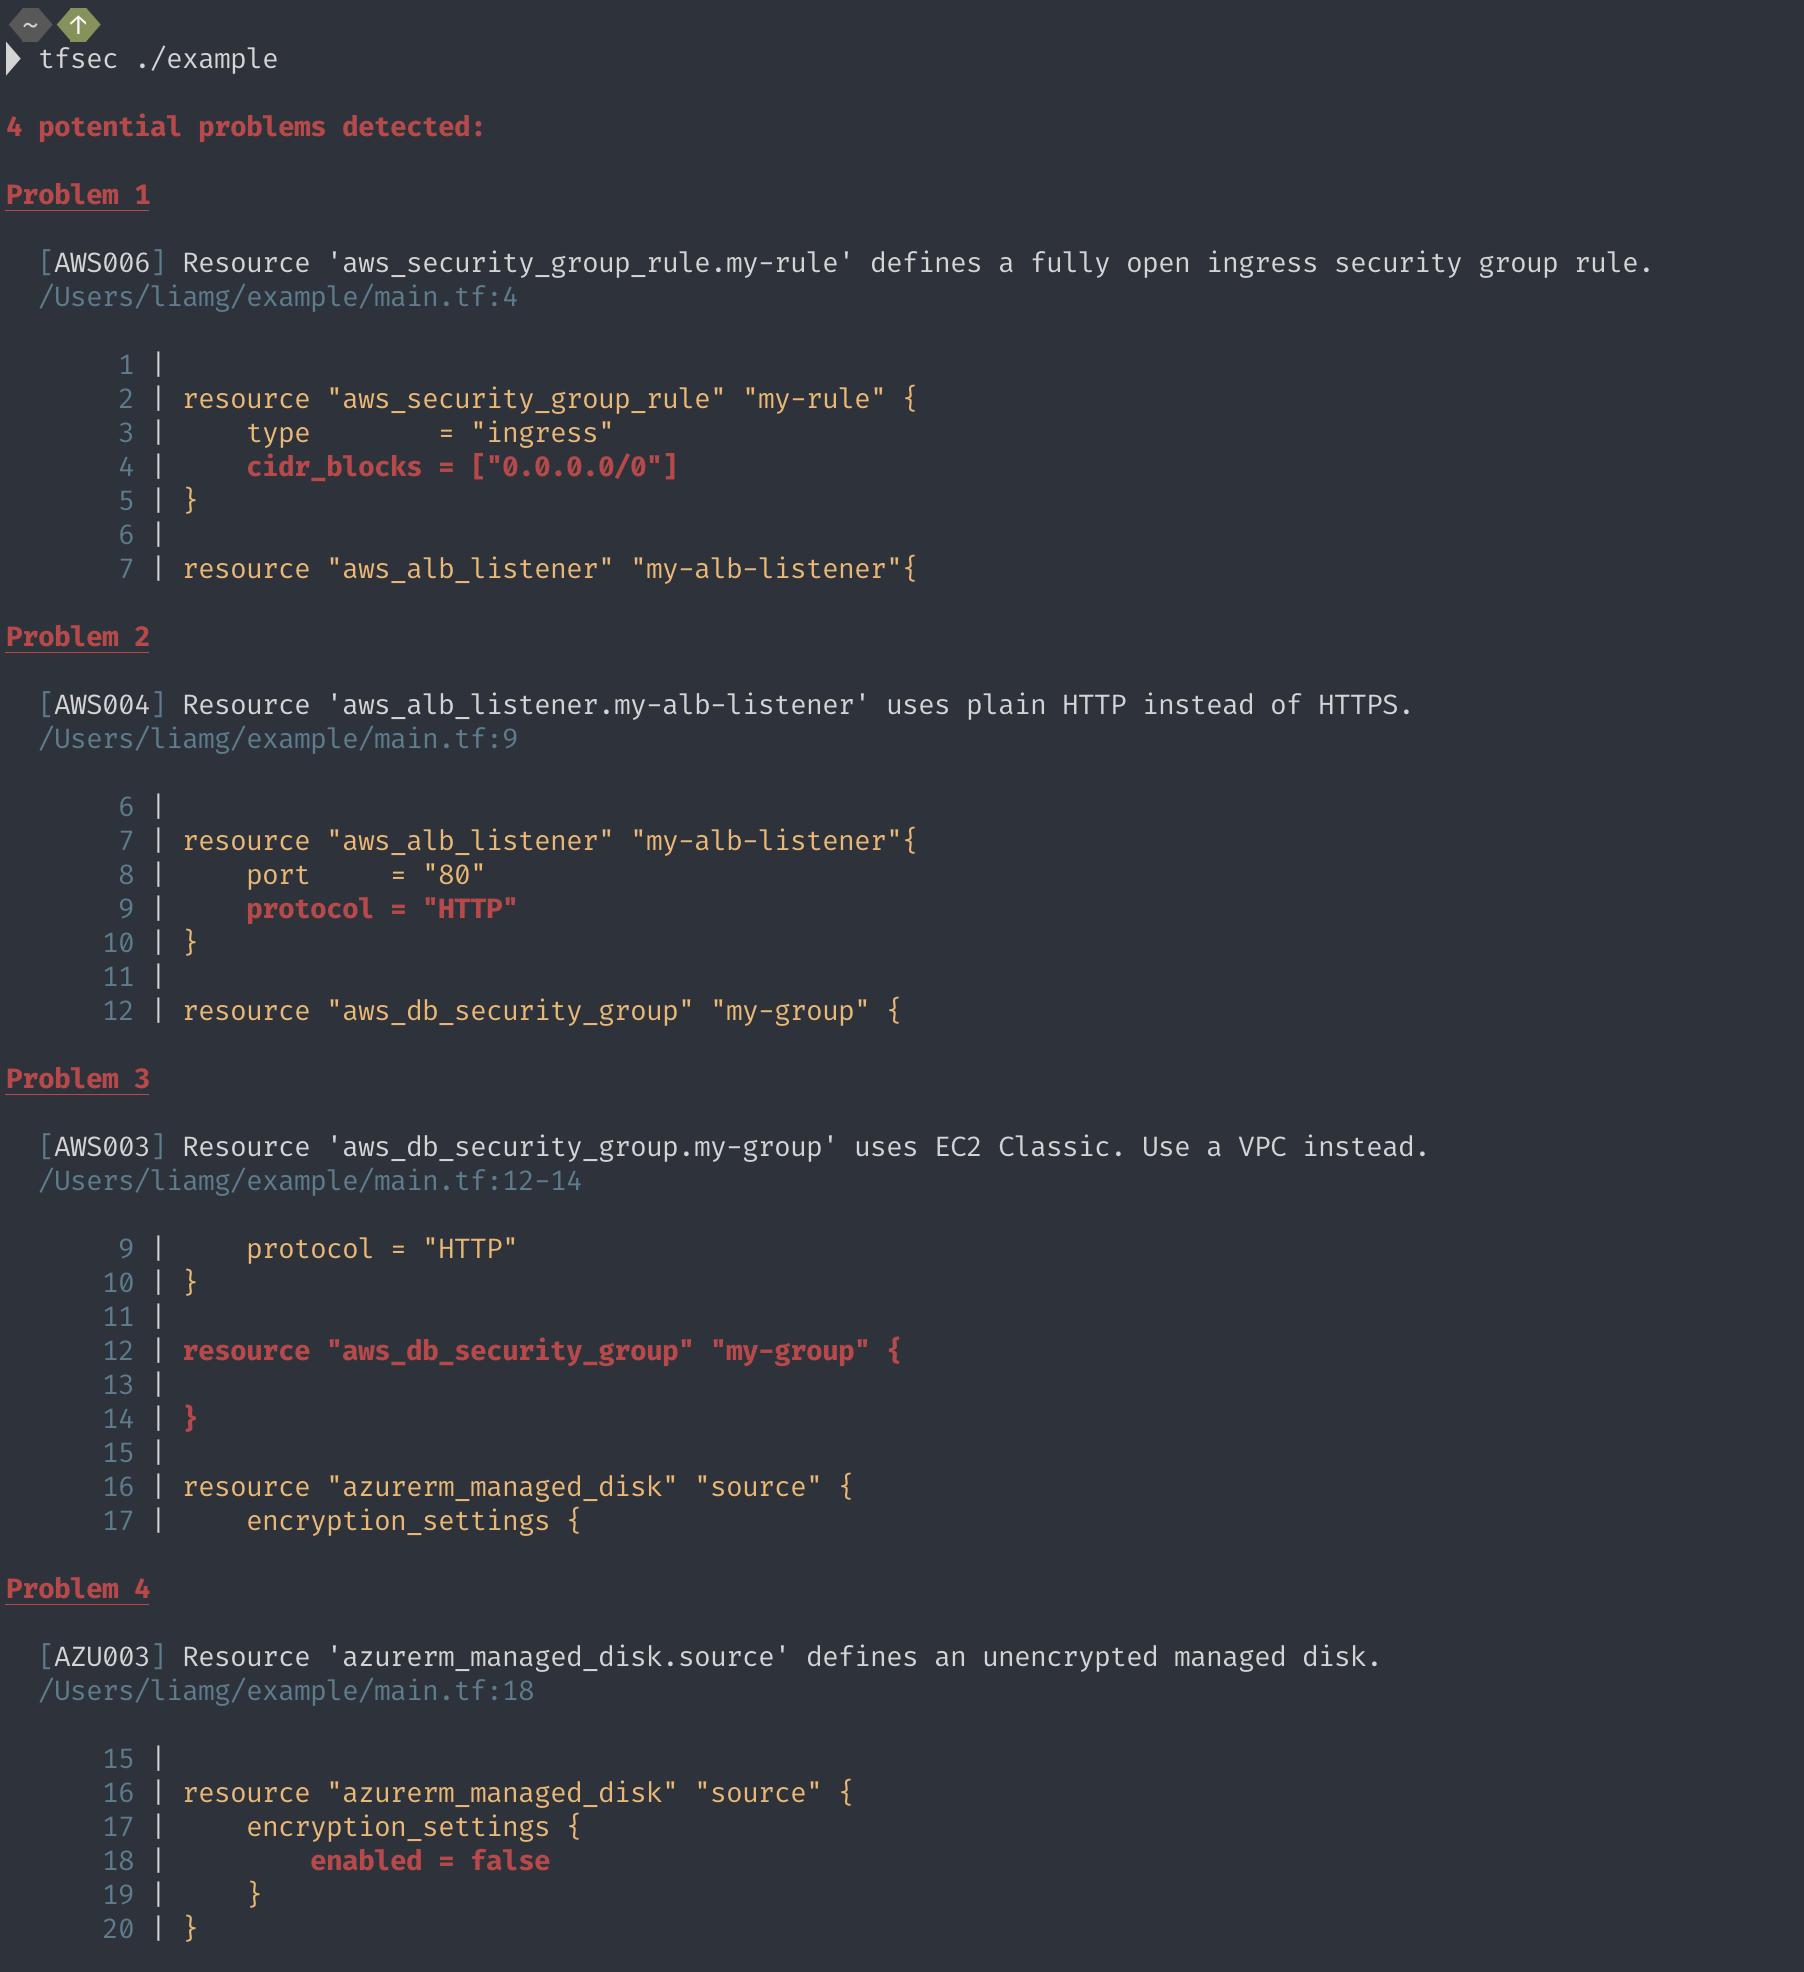 scan terraform code